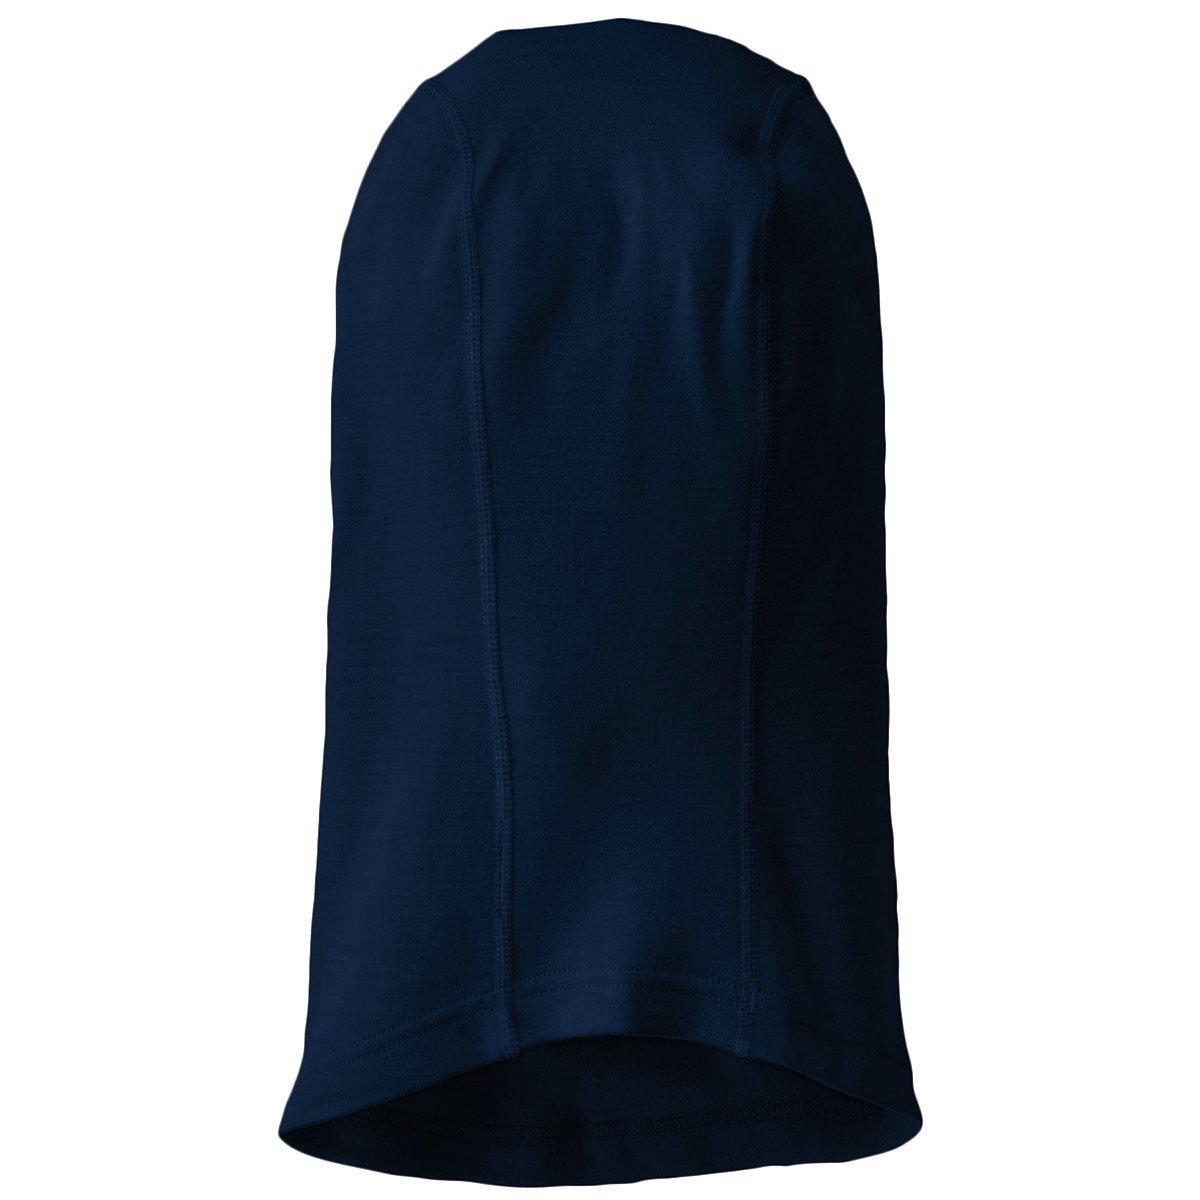 Minus33 Merino Wool Clothing Unisex Midweight Wool Balaclava, Navy, One Size by Minus33 Merino Wool (Image #5)